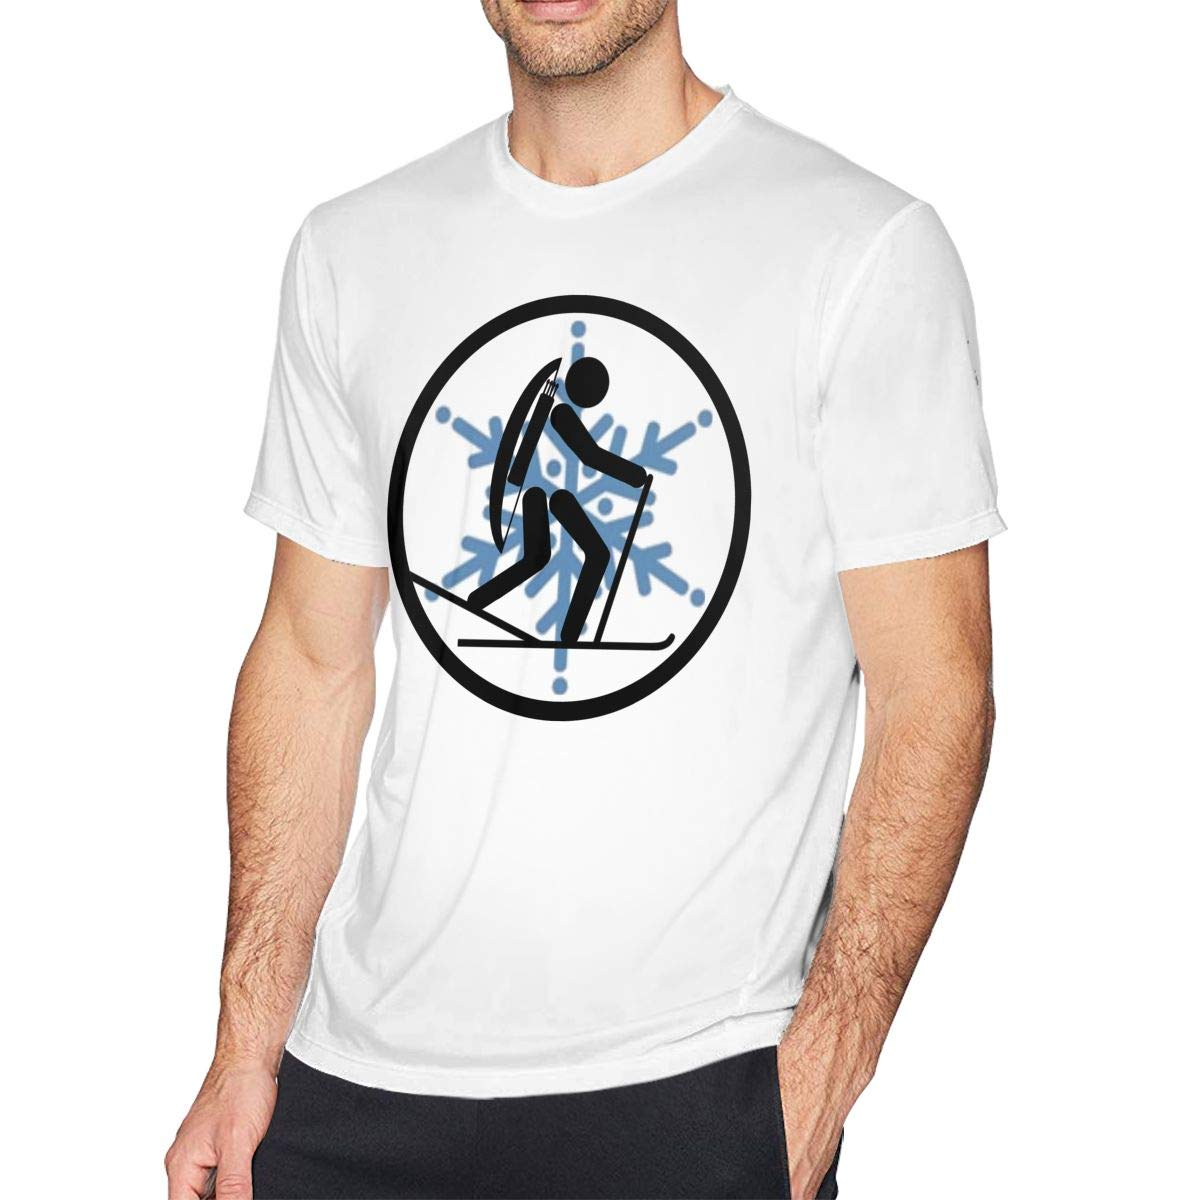 Casual Shirt for Men Teenagers Cross-Country Skiing Mens Shirt Short Sleeve T-Shirt